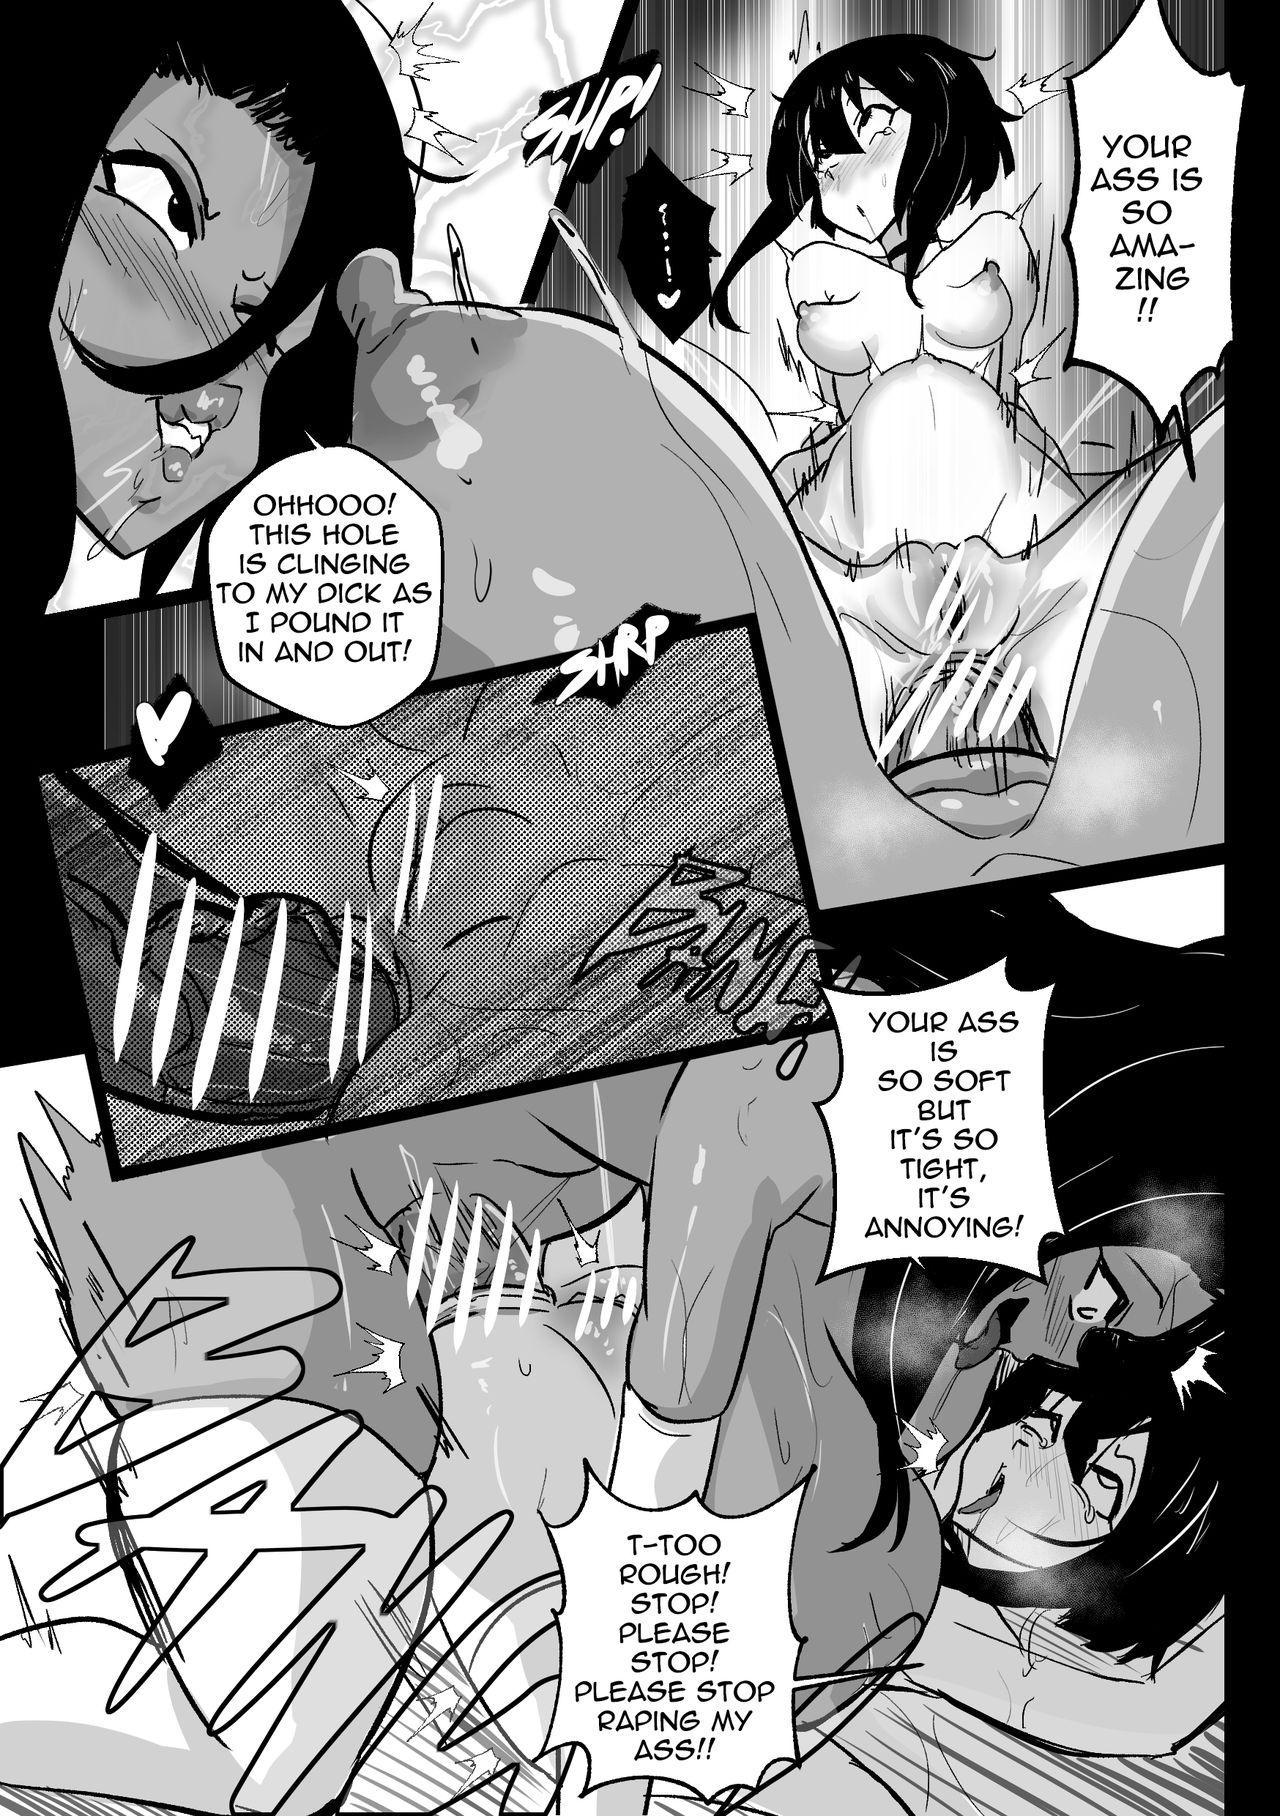 B-Trayal 29 Sylvia(kunosuba) Censored (EN) 10